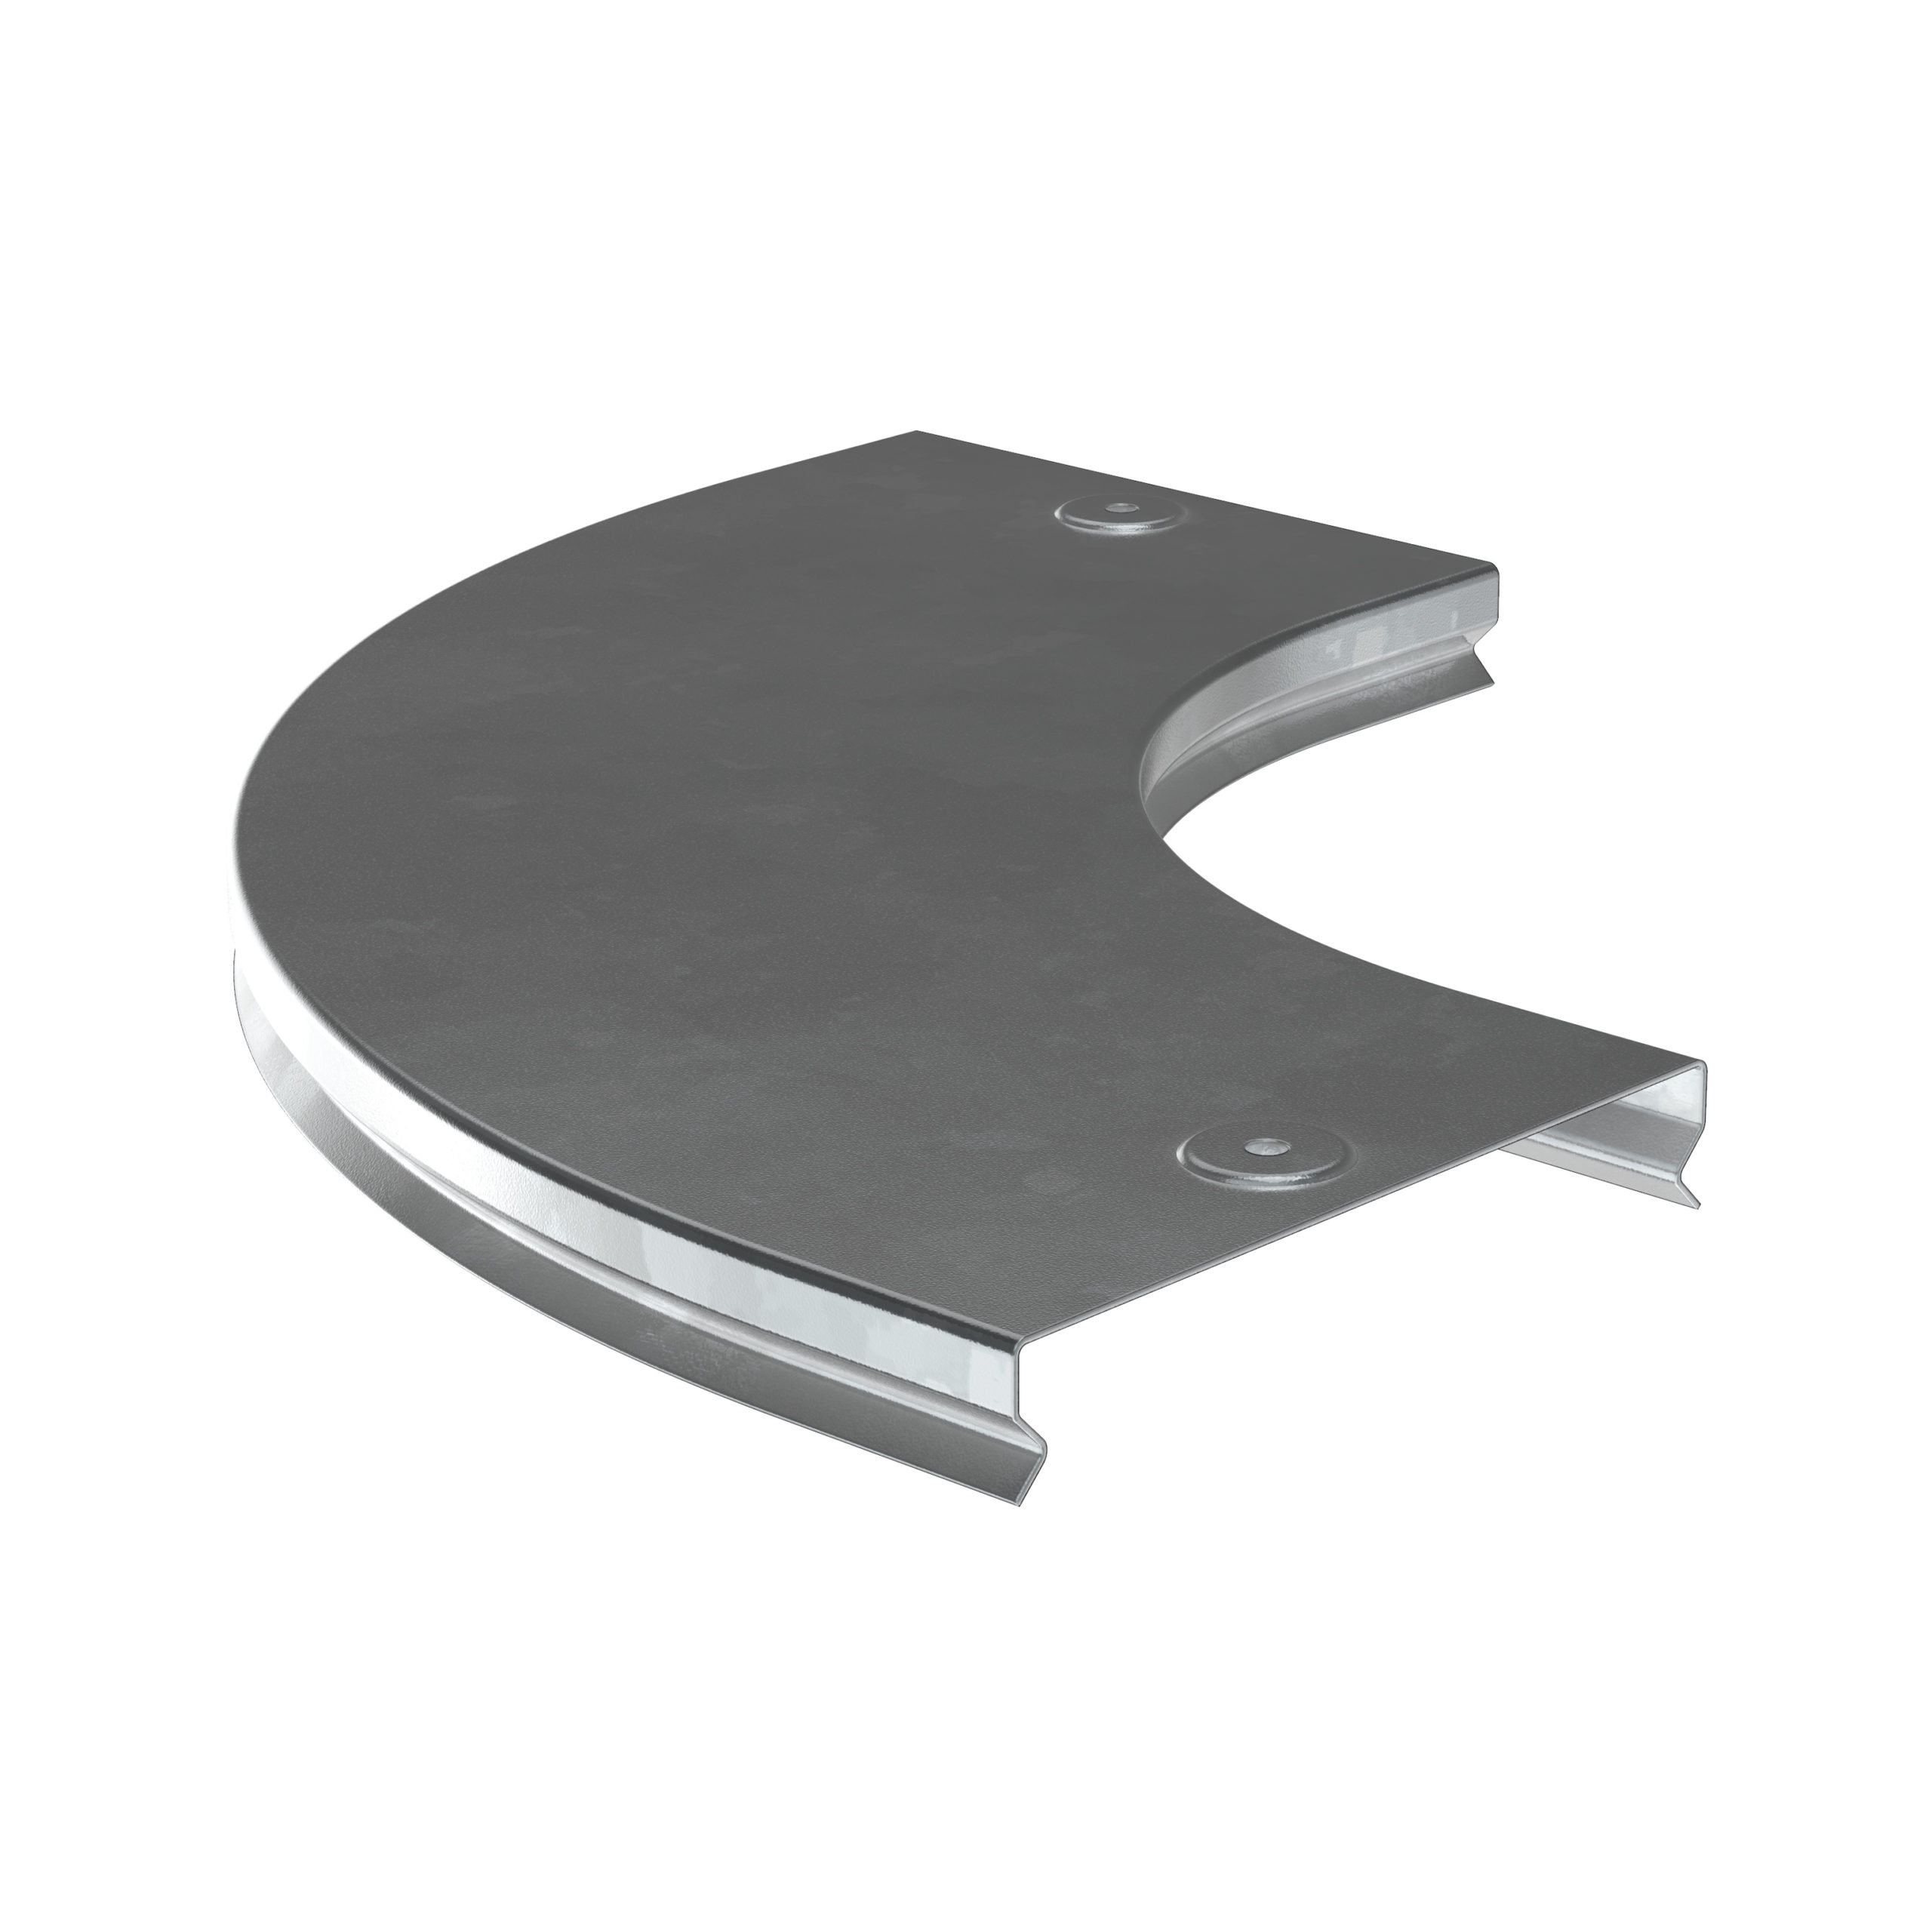 Крышка поворота плавного 90град (тип Г01) ESCA 600мм HDZ IEK 1